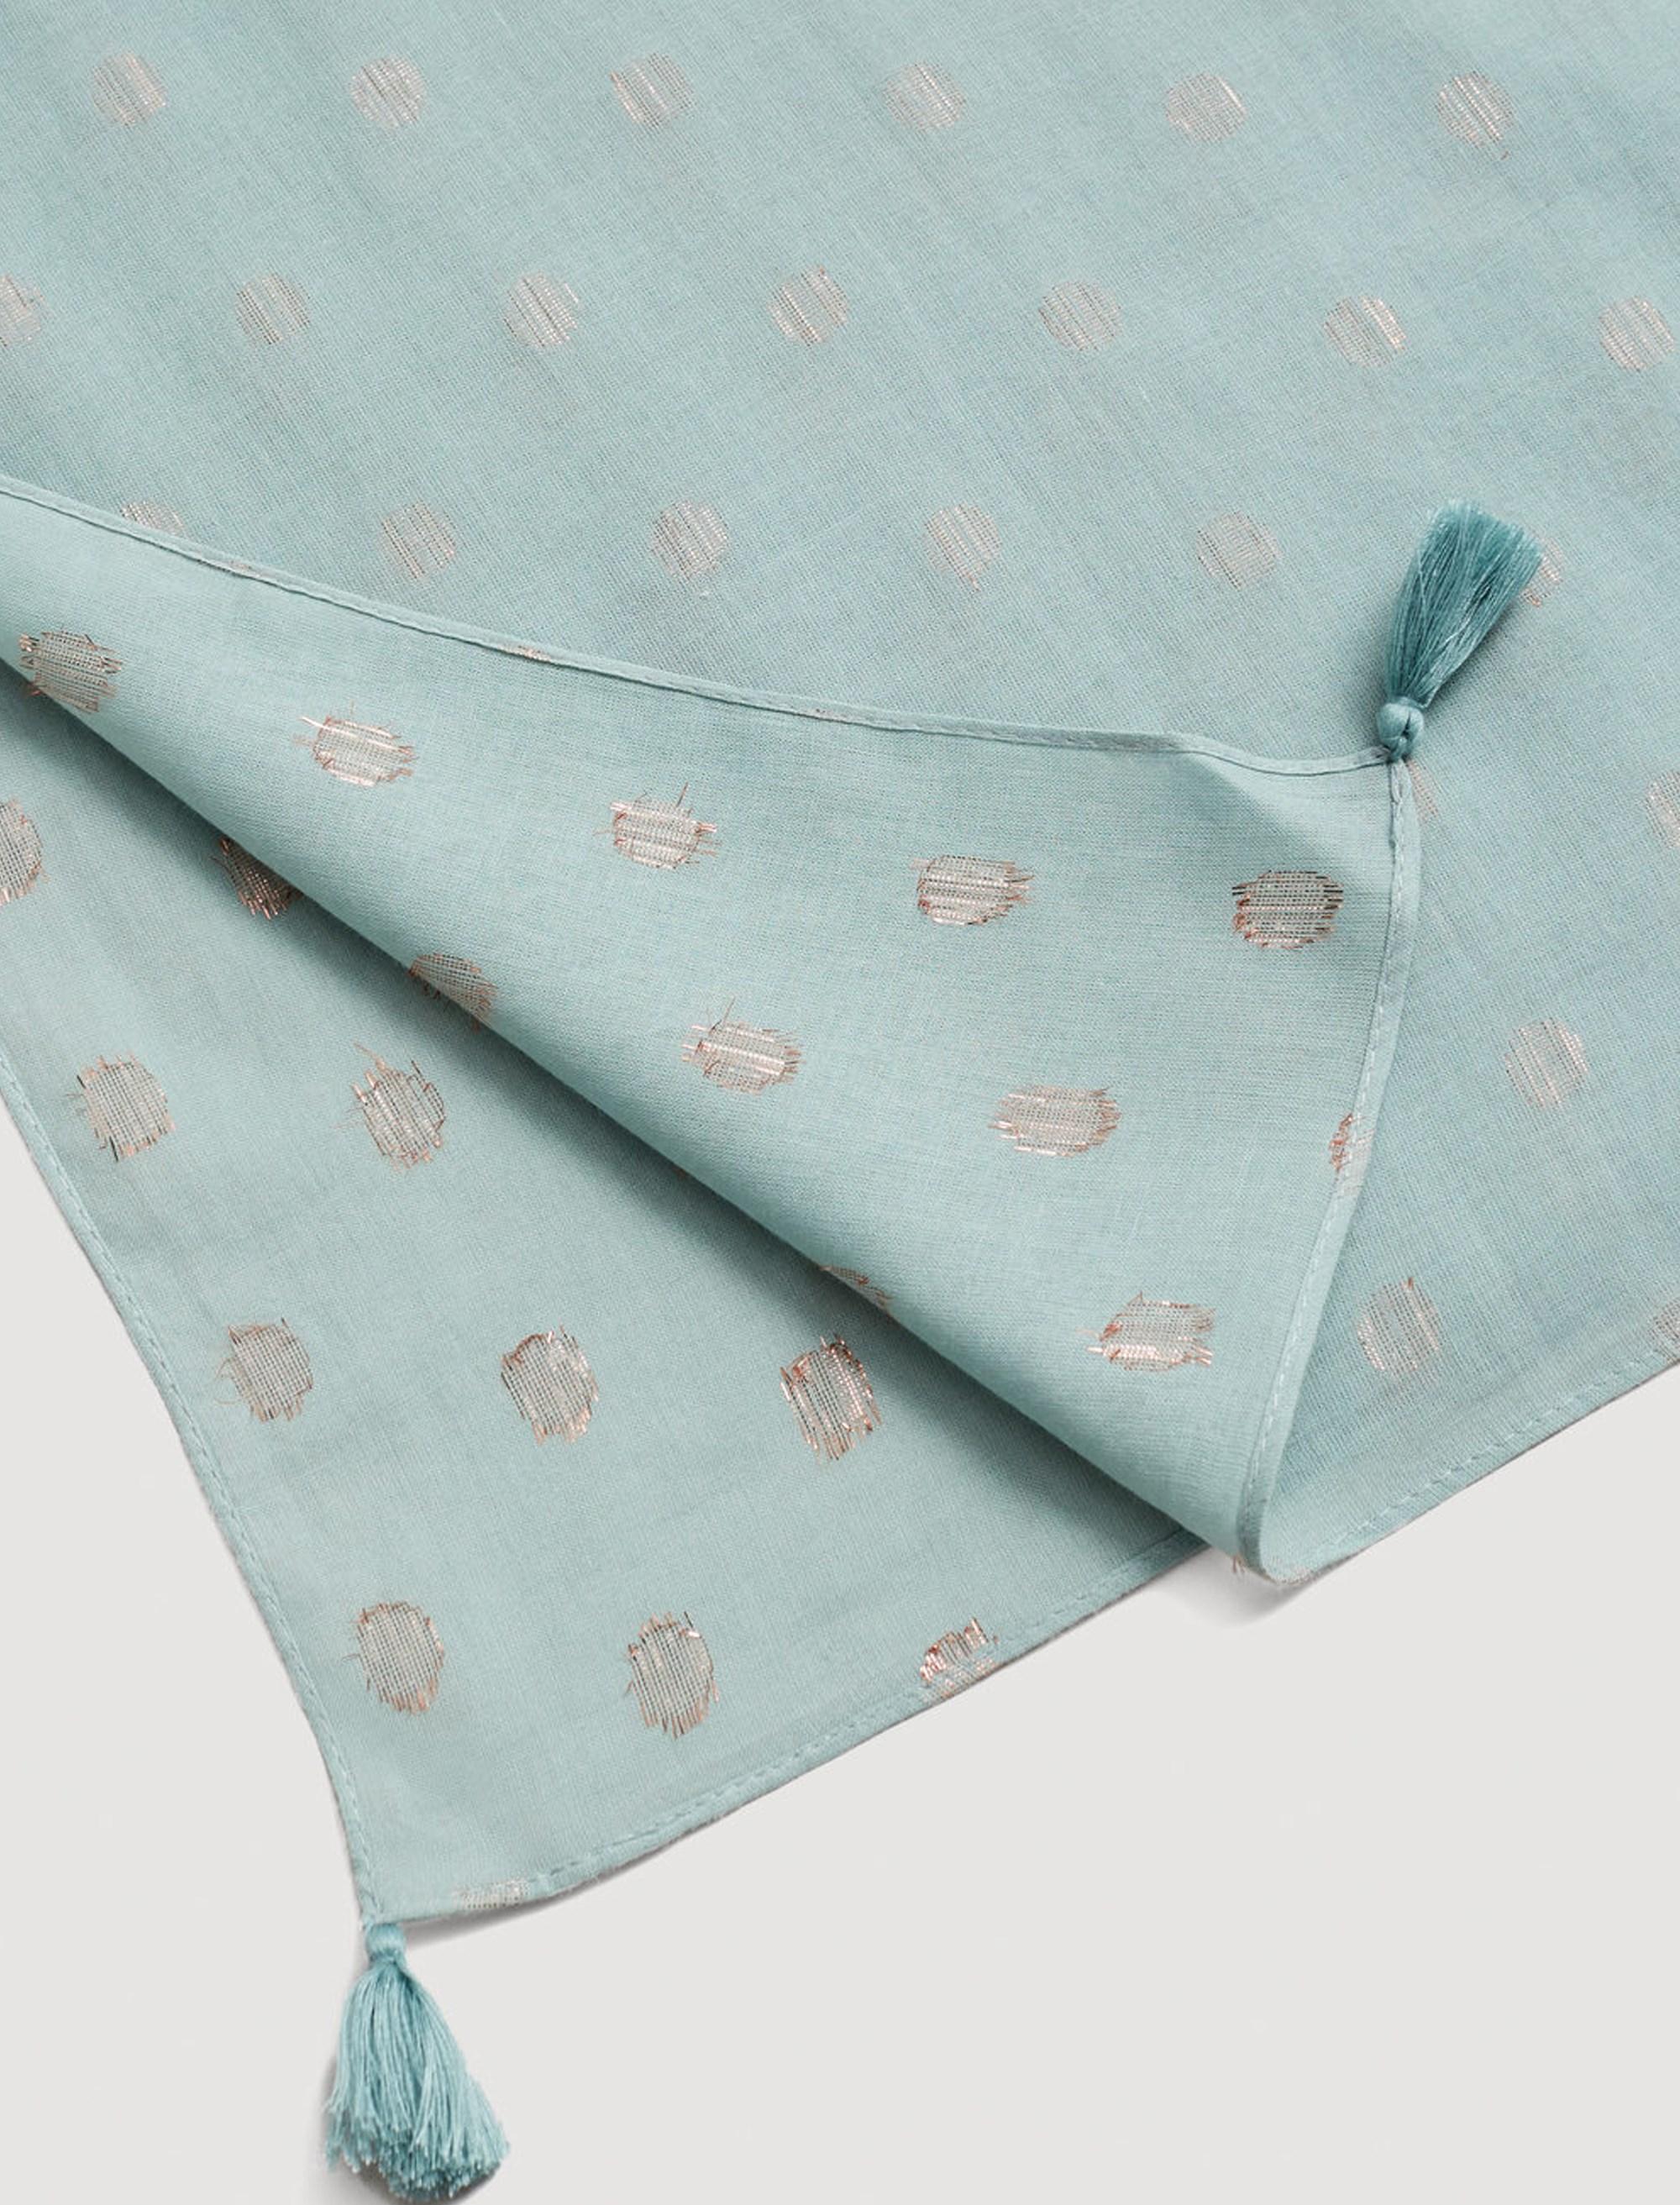 روسری نخی طرح دار زنانه - مانگو - آبي روشن - 3